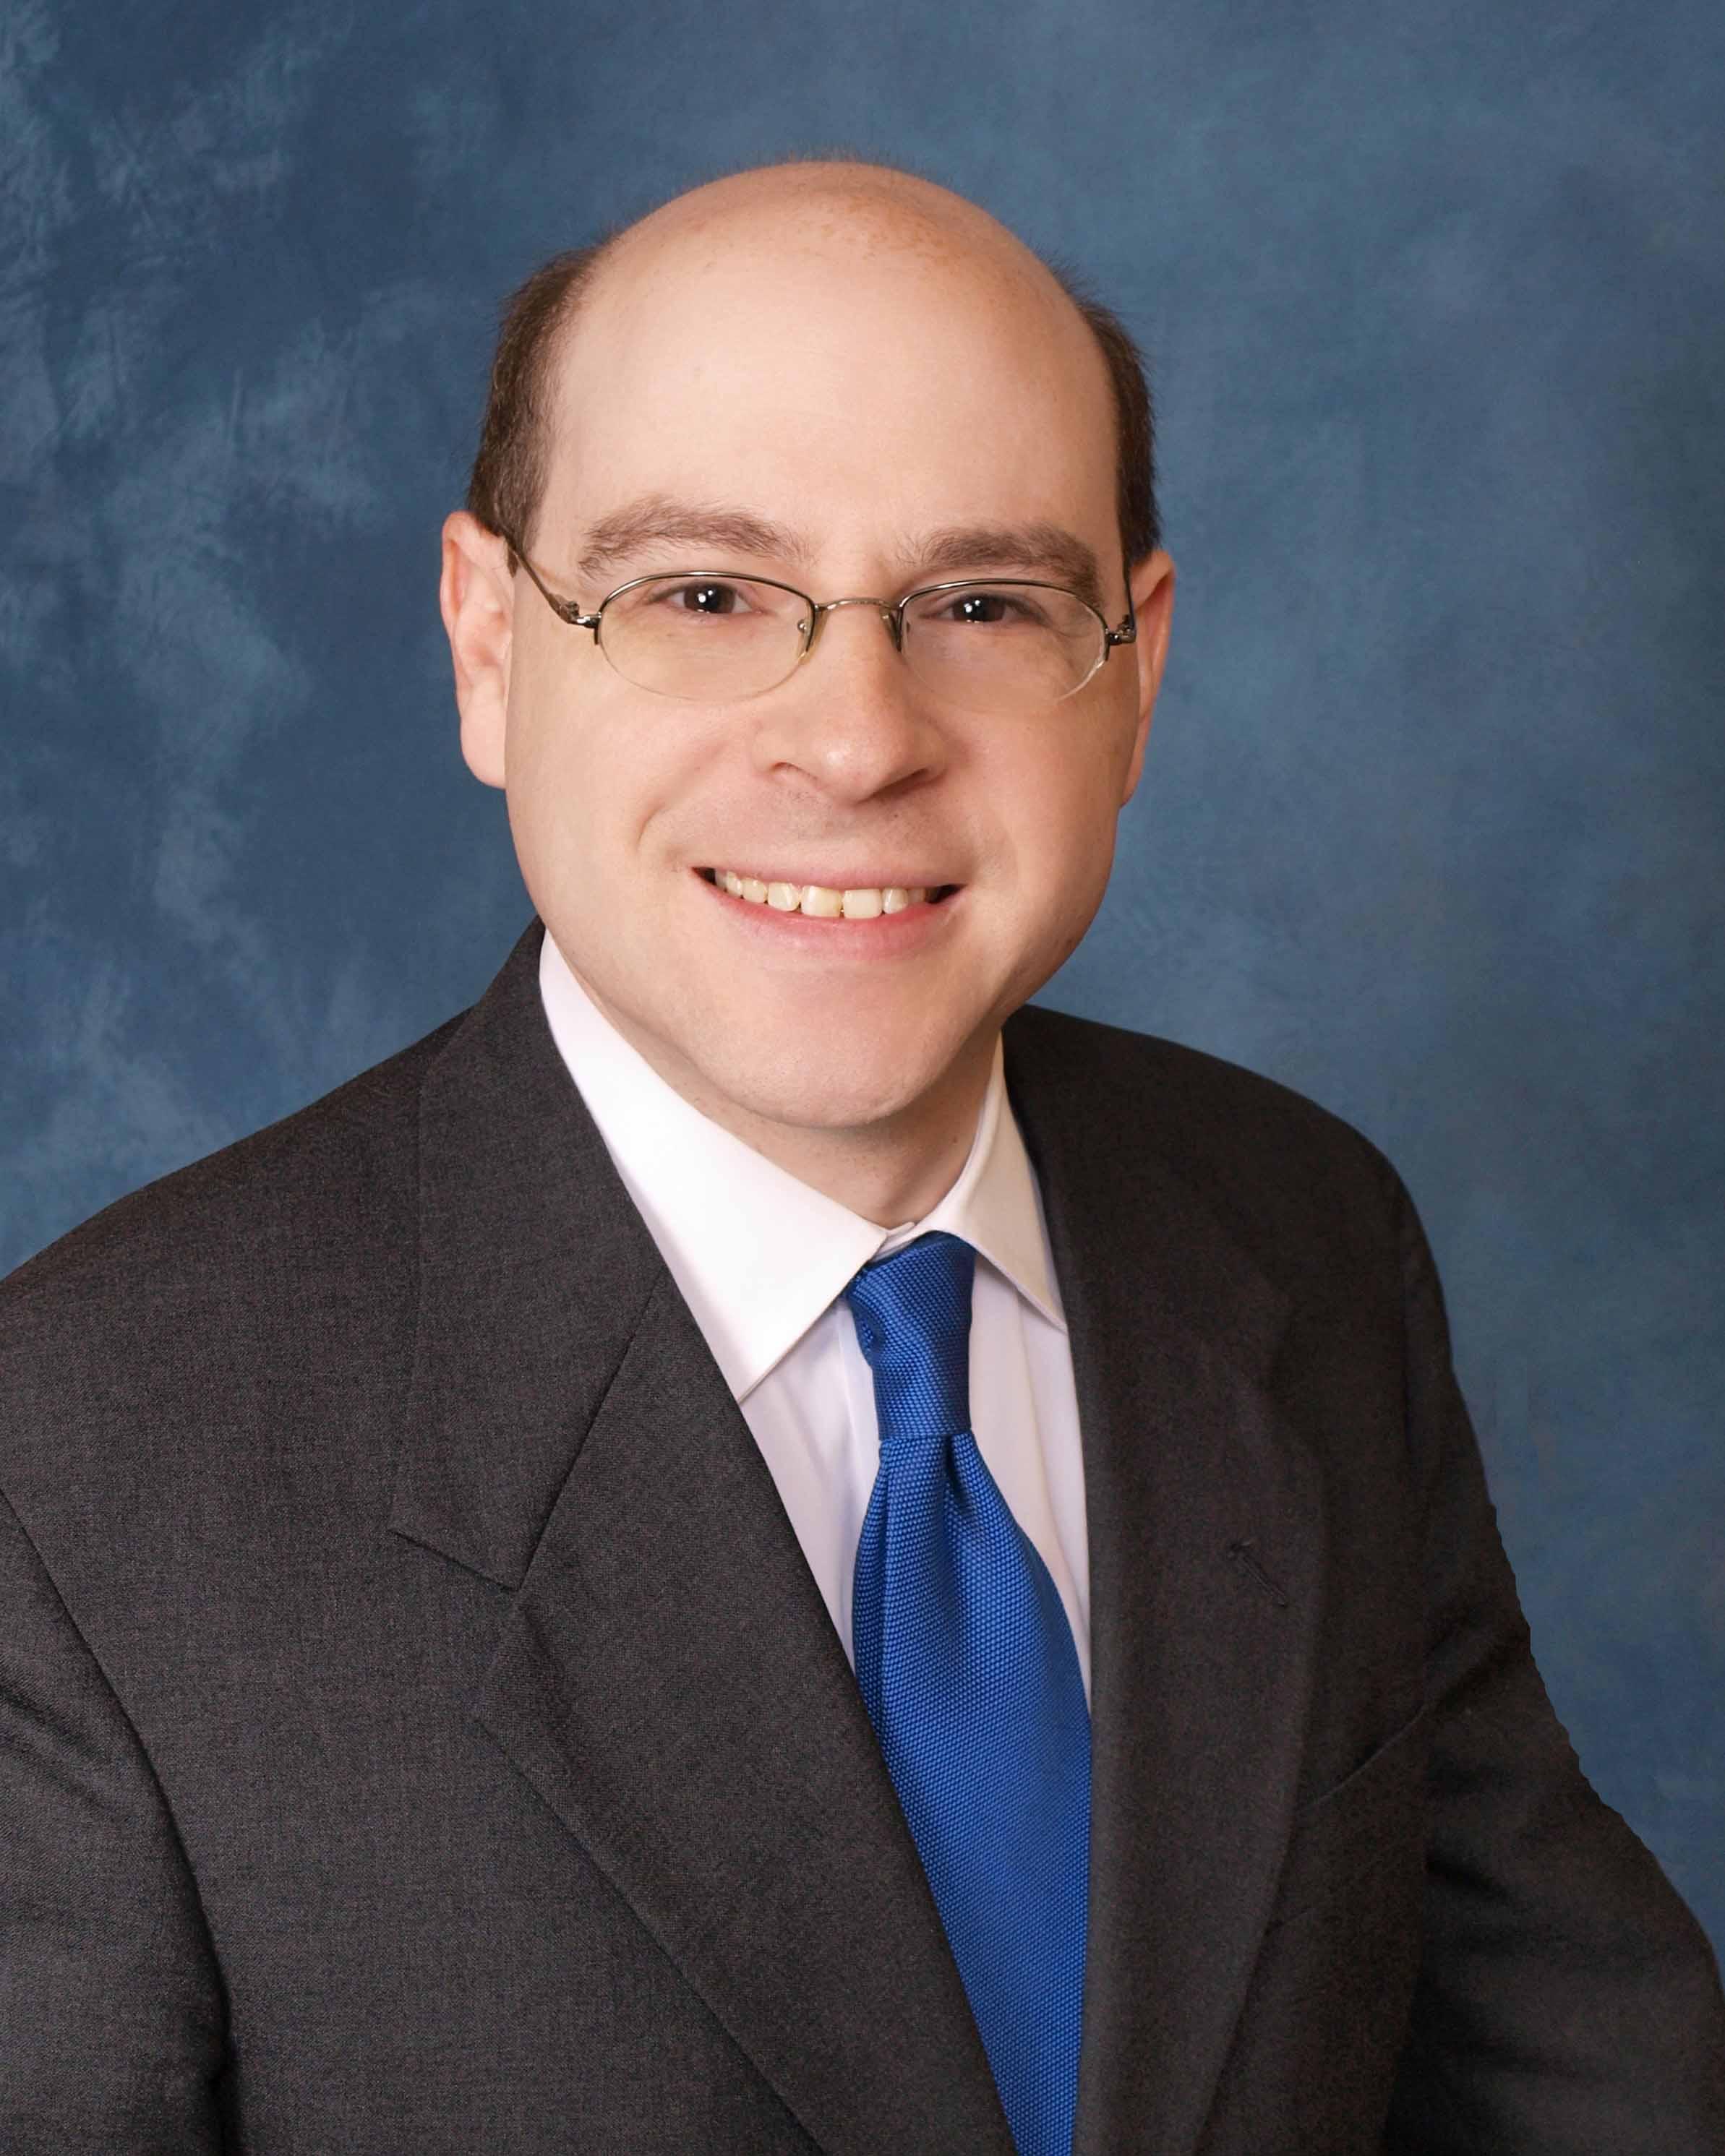 Jeffrey R. Brown, Esq., LLC